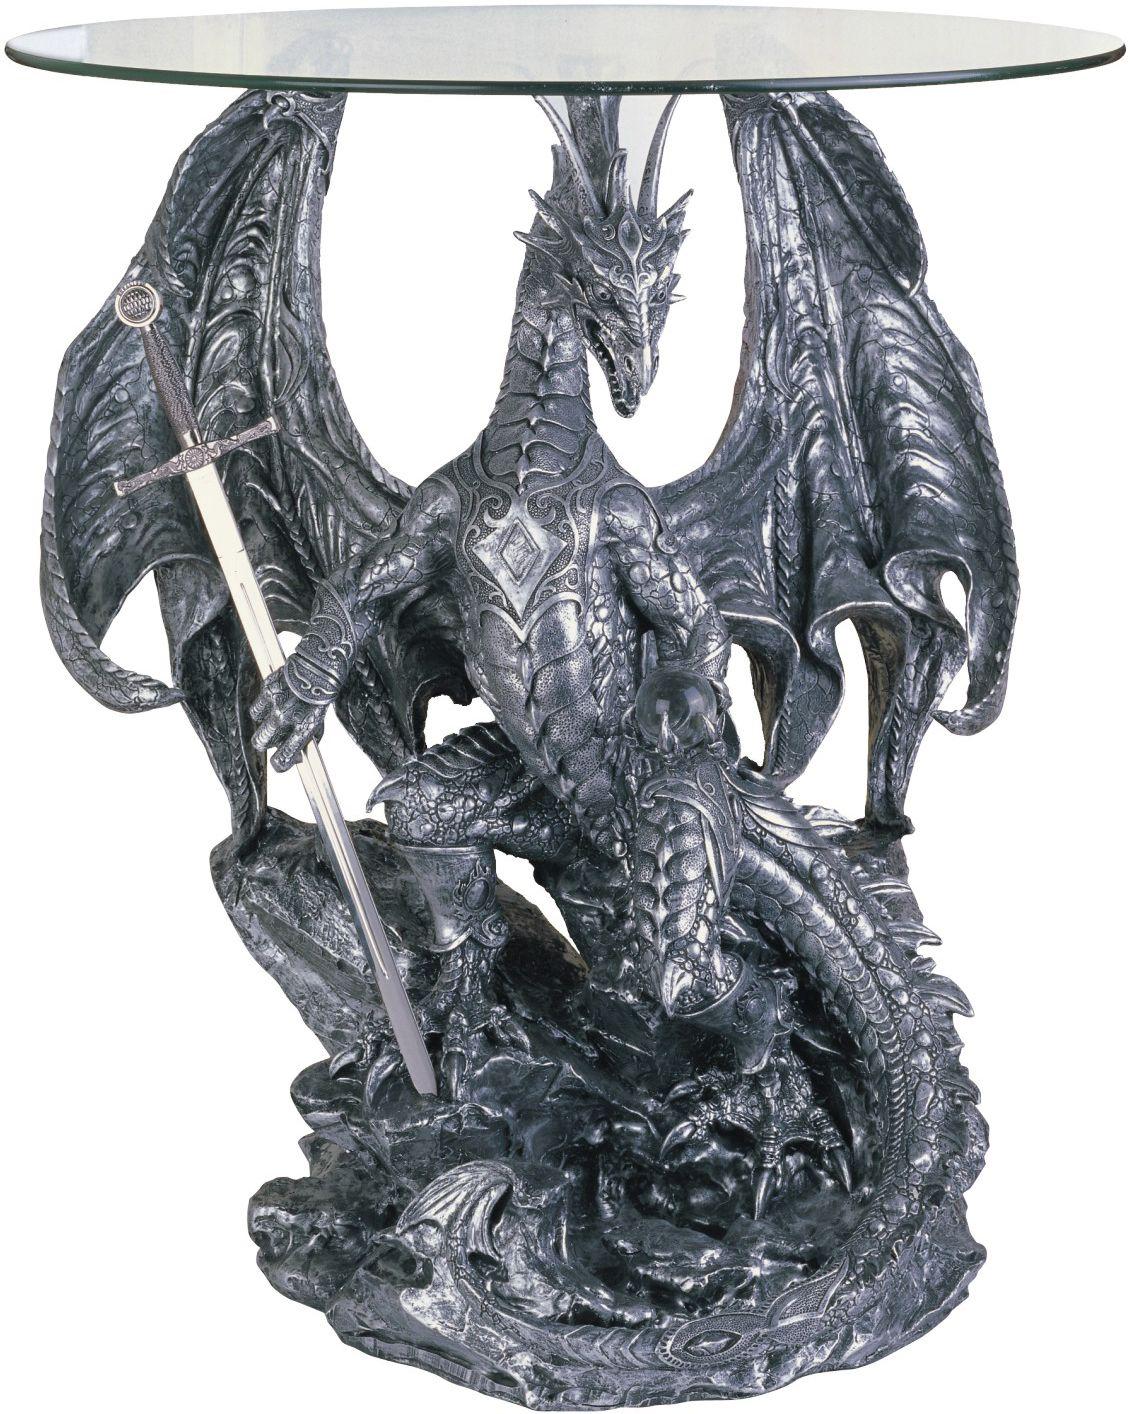 Dragon Furniture   Dragon Furniture Collection End Table Decor Decoration    EBay